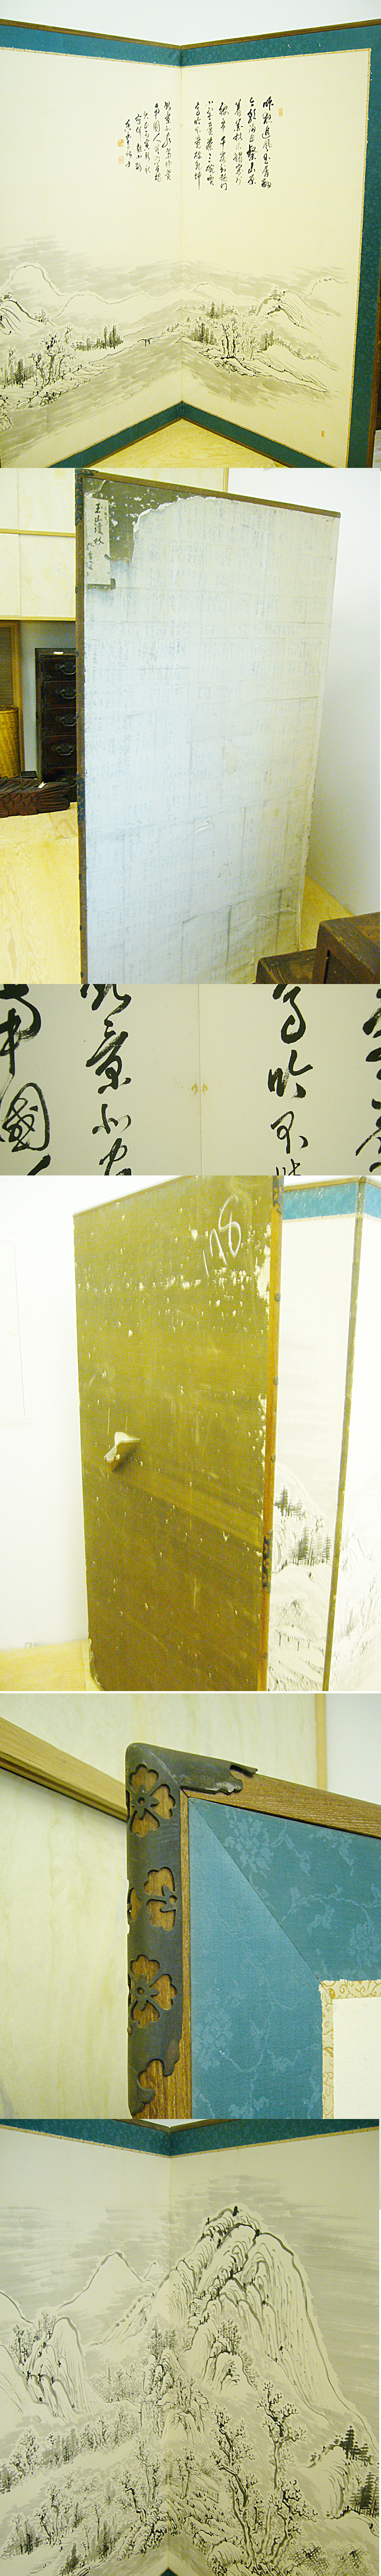 original japanischer antiker paravent byoubu raumteiler 1912 1926taish zeit in in berlin ebay. Black Bedroom Furniture Sets. Home Design Ideas